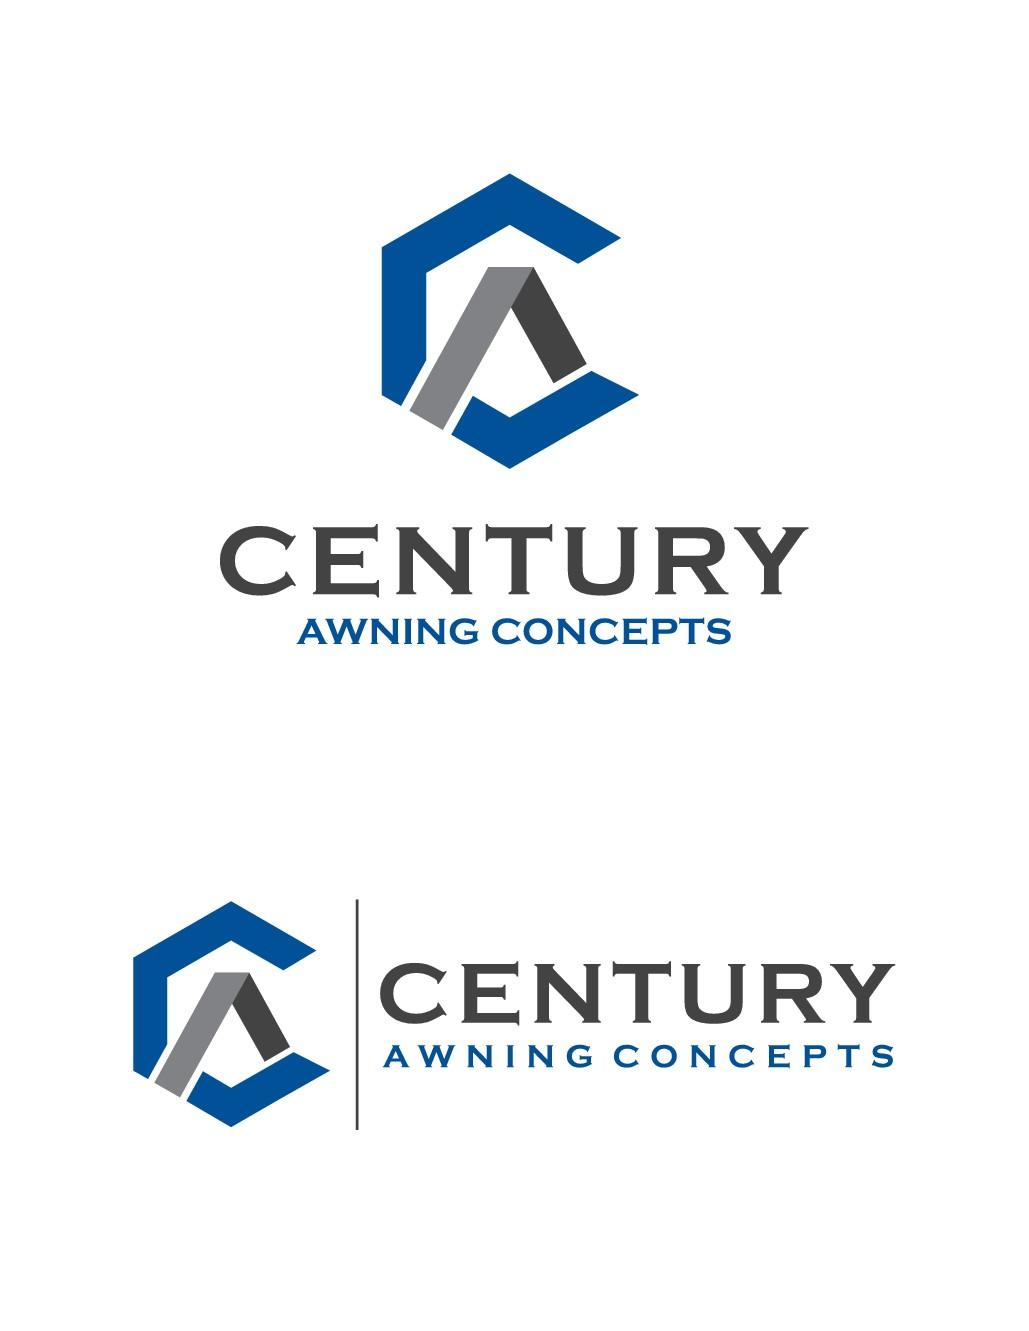 New NYC based Awning Company Needs a Logo